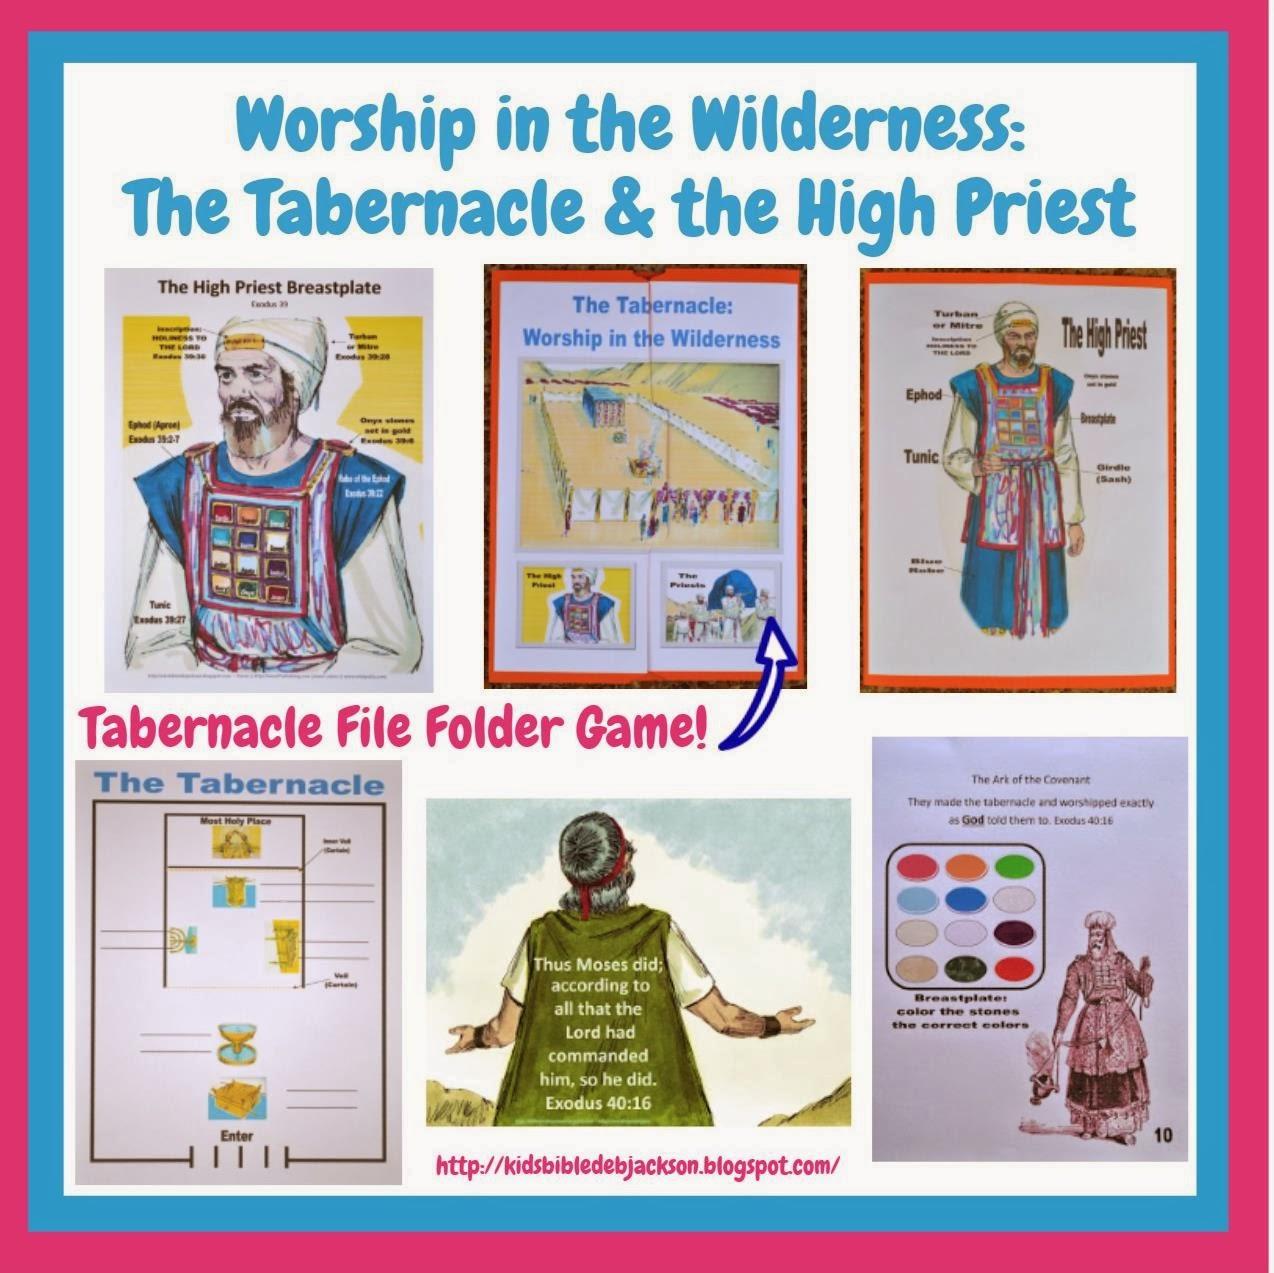 http://kidsbibledebjackson.blogspot.com/2013/11/moses-tabernacle-worship-in-wilderness.html